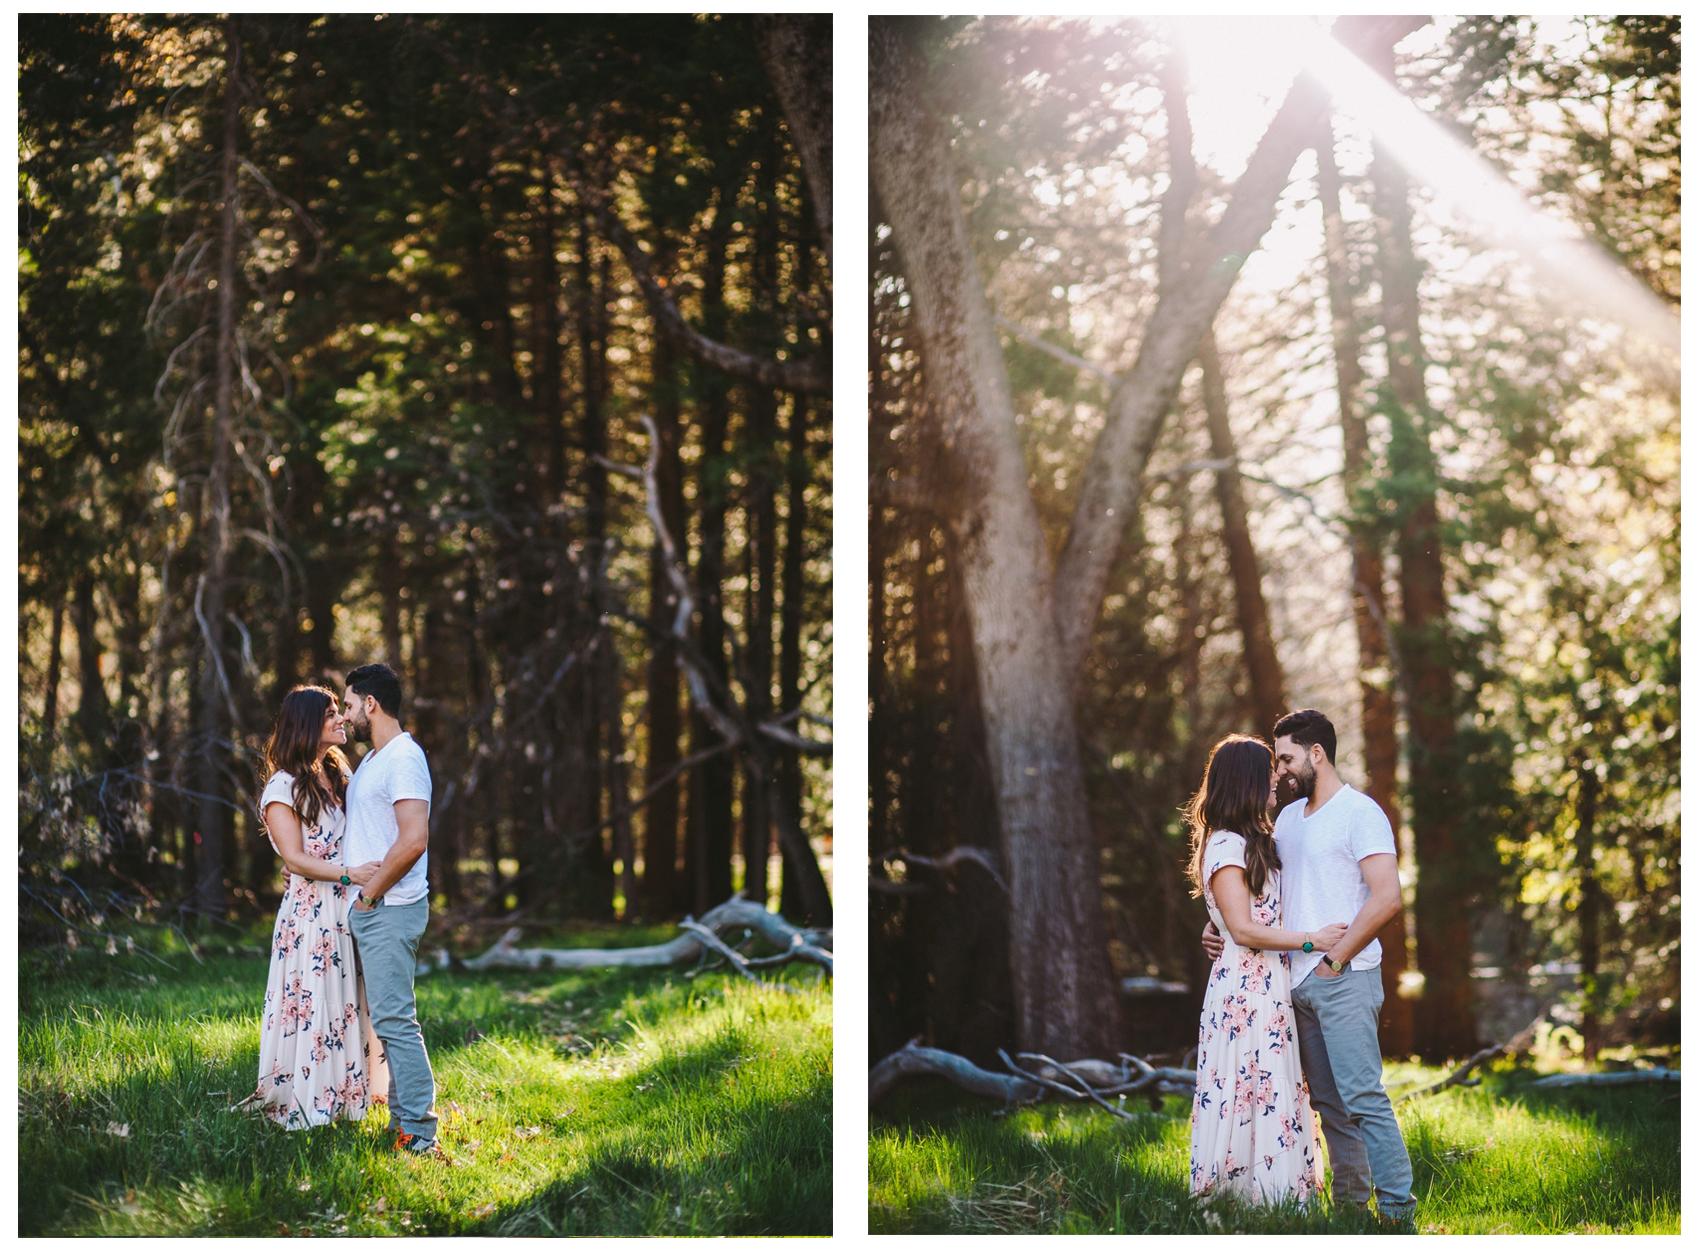 Couple & Sun Flare in Yosemite Woodland